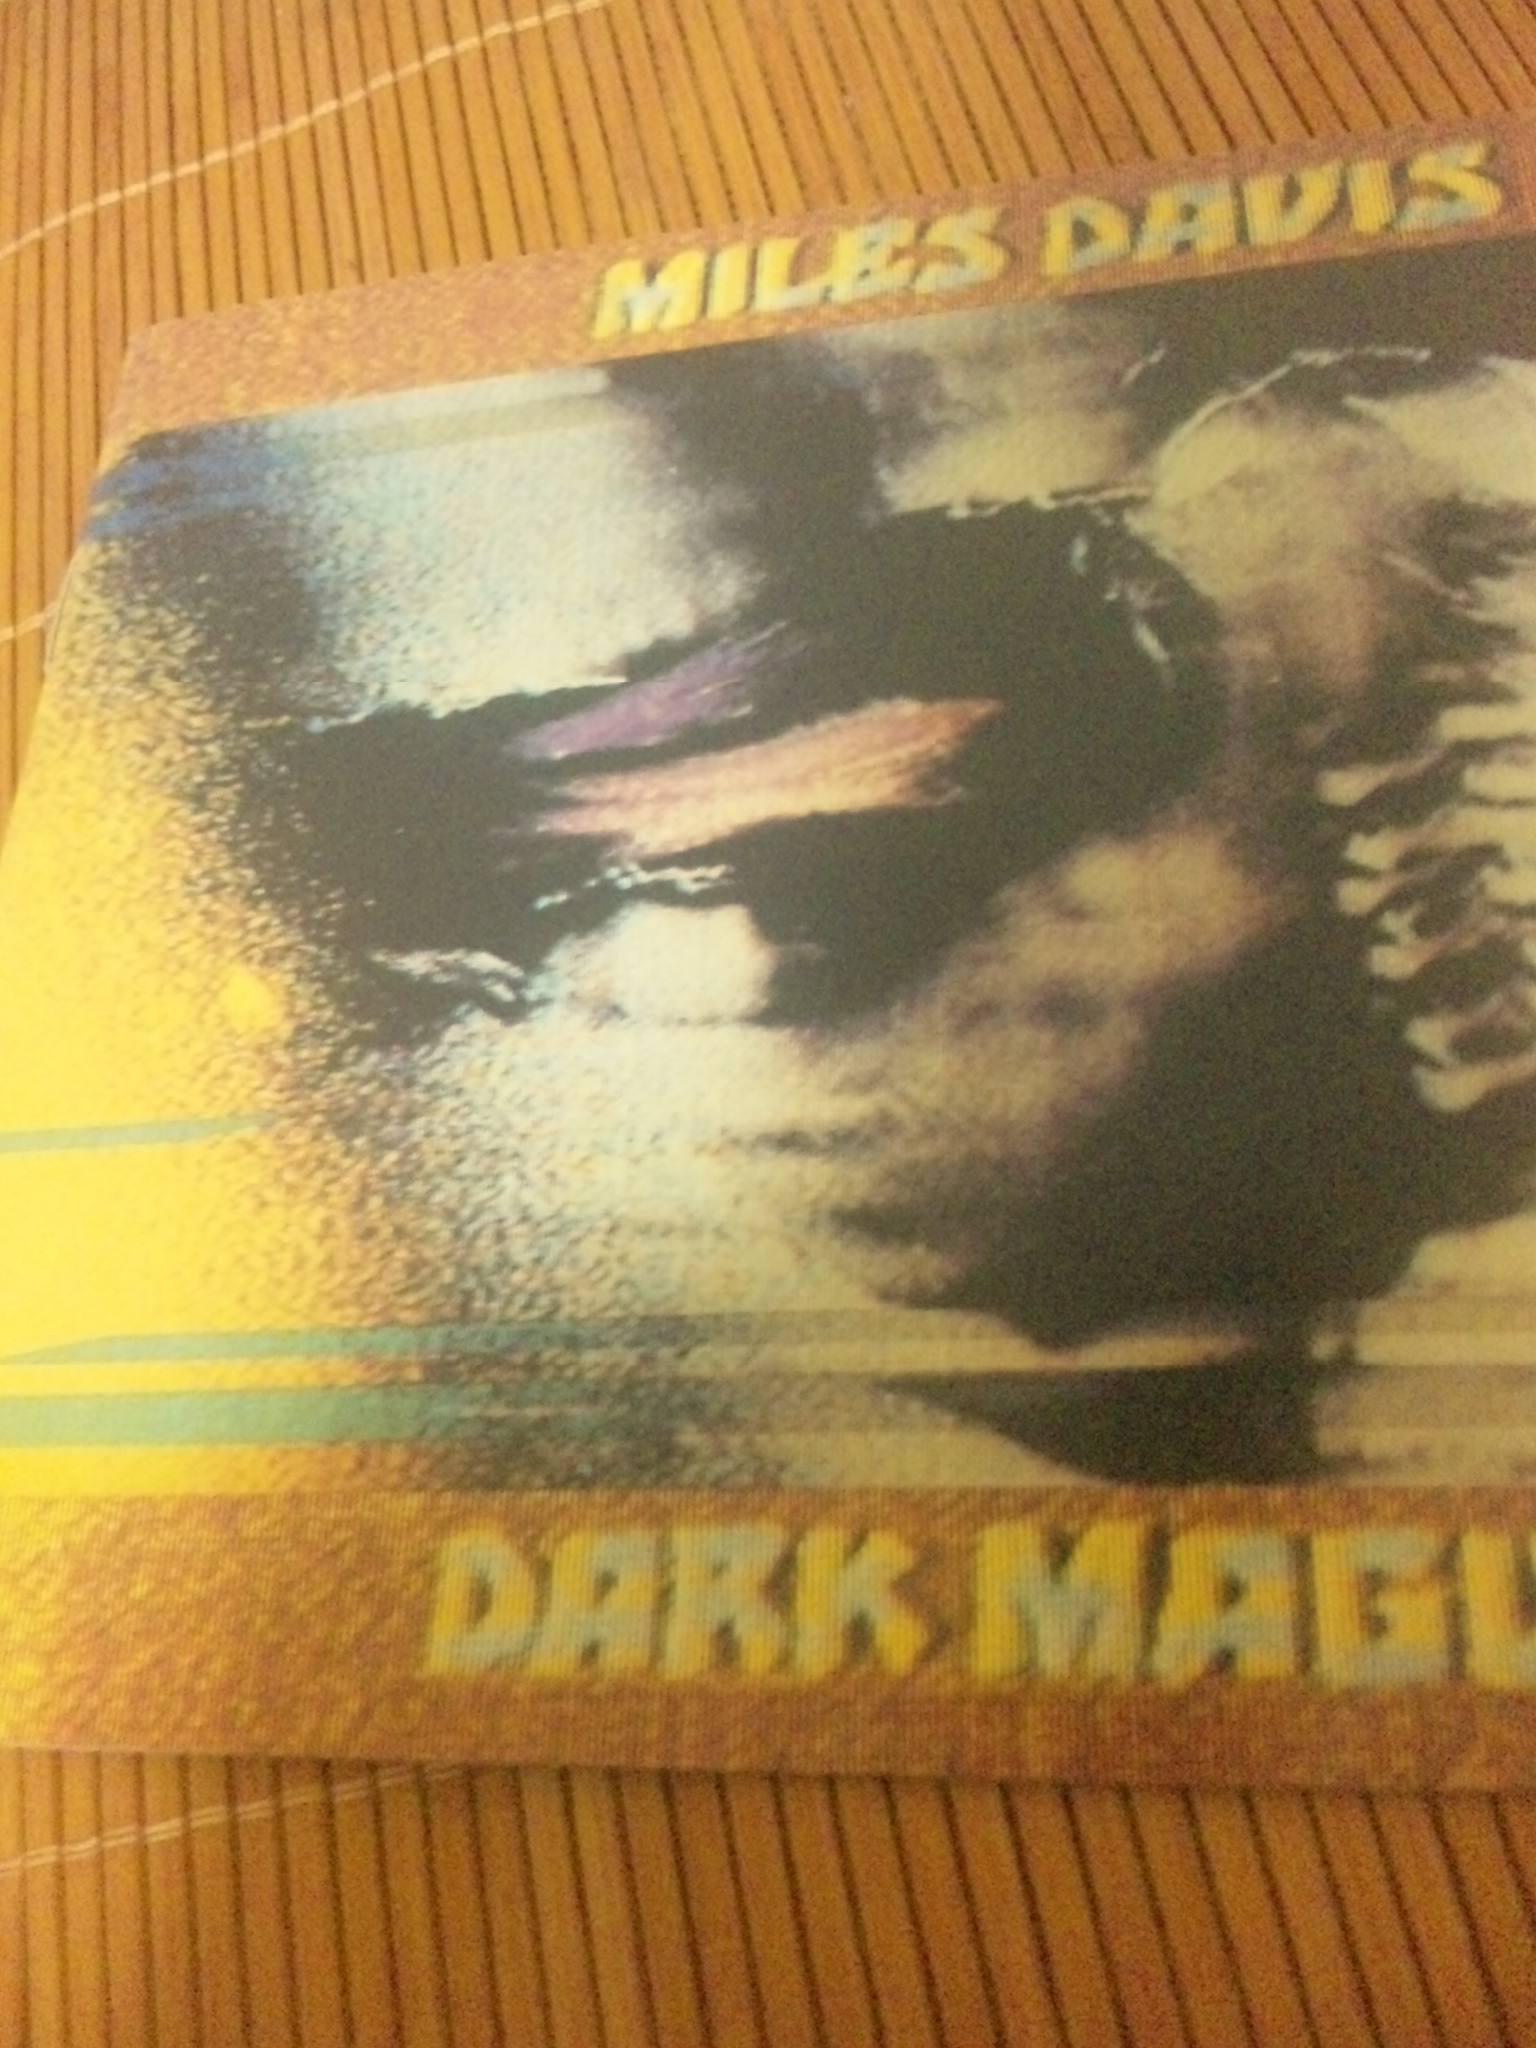 MILES DAVIS;DARK MAGUS